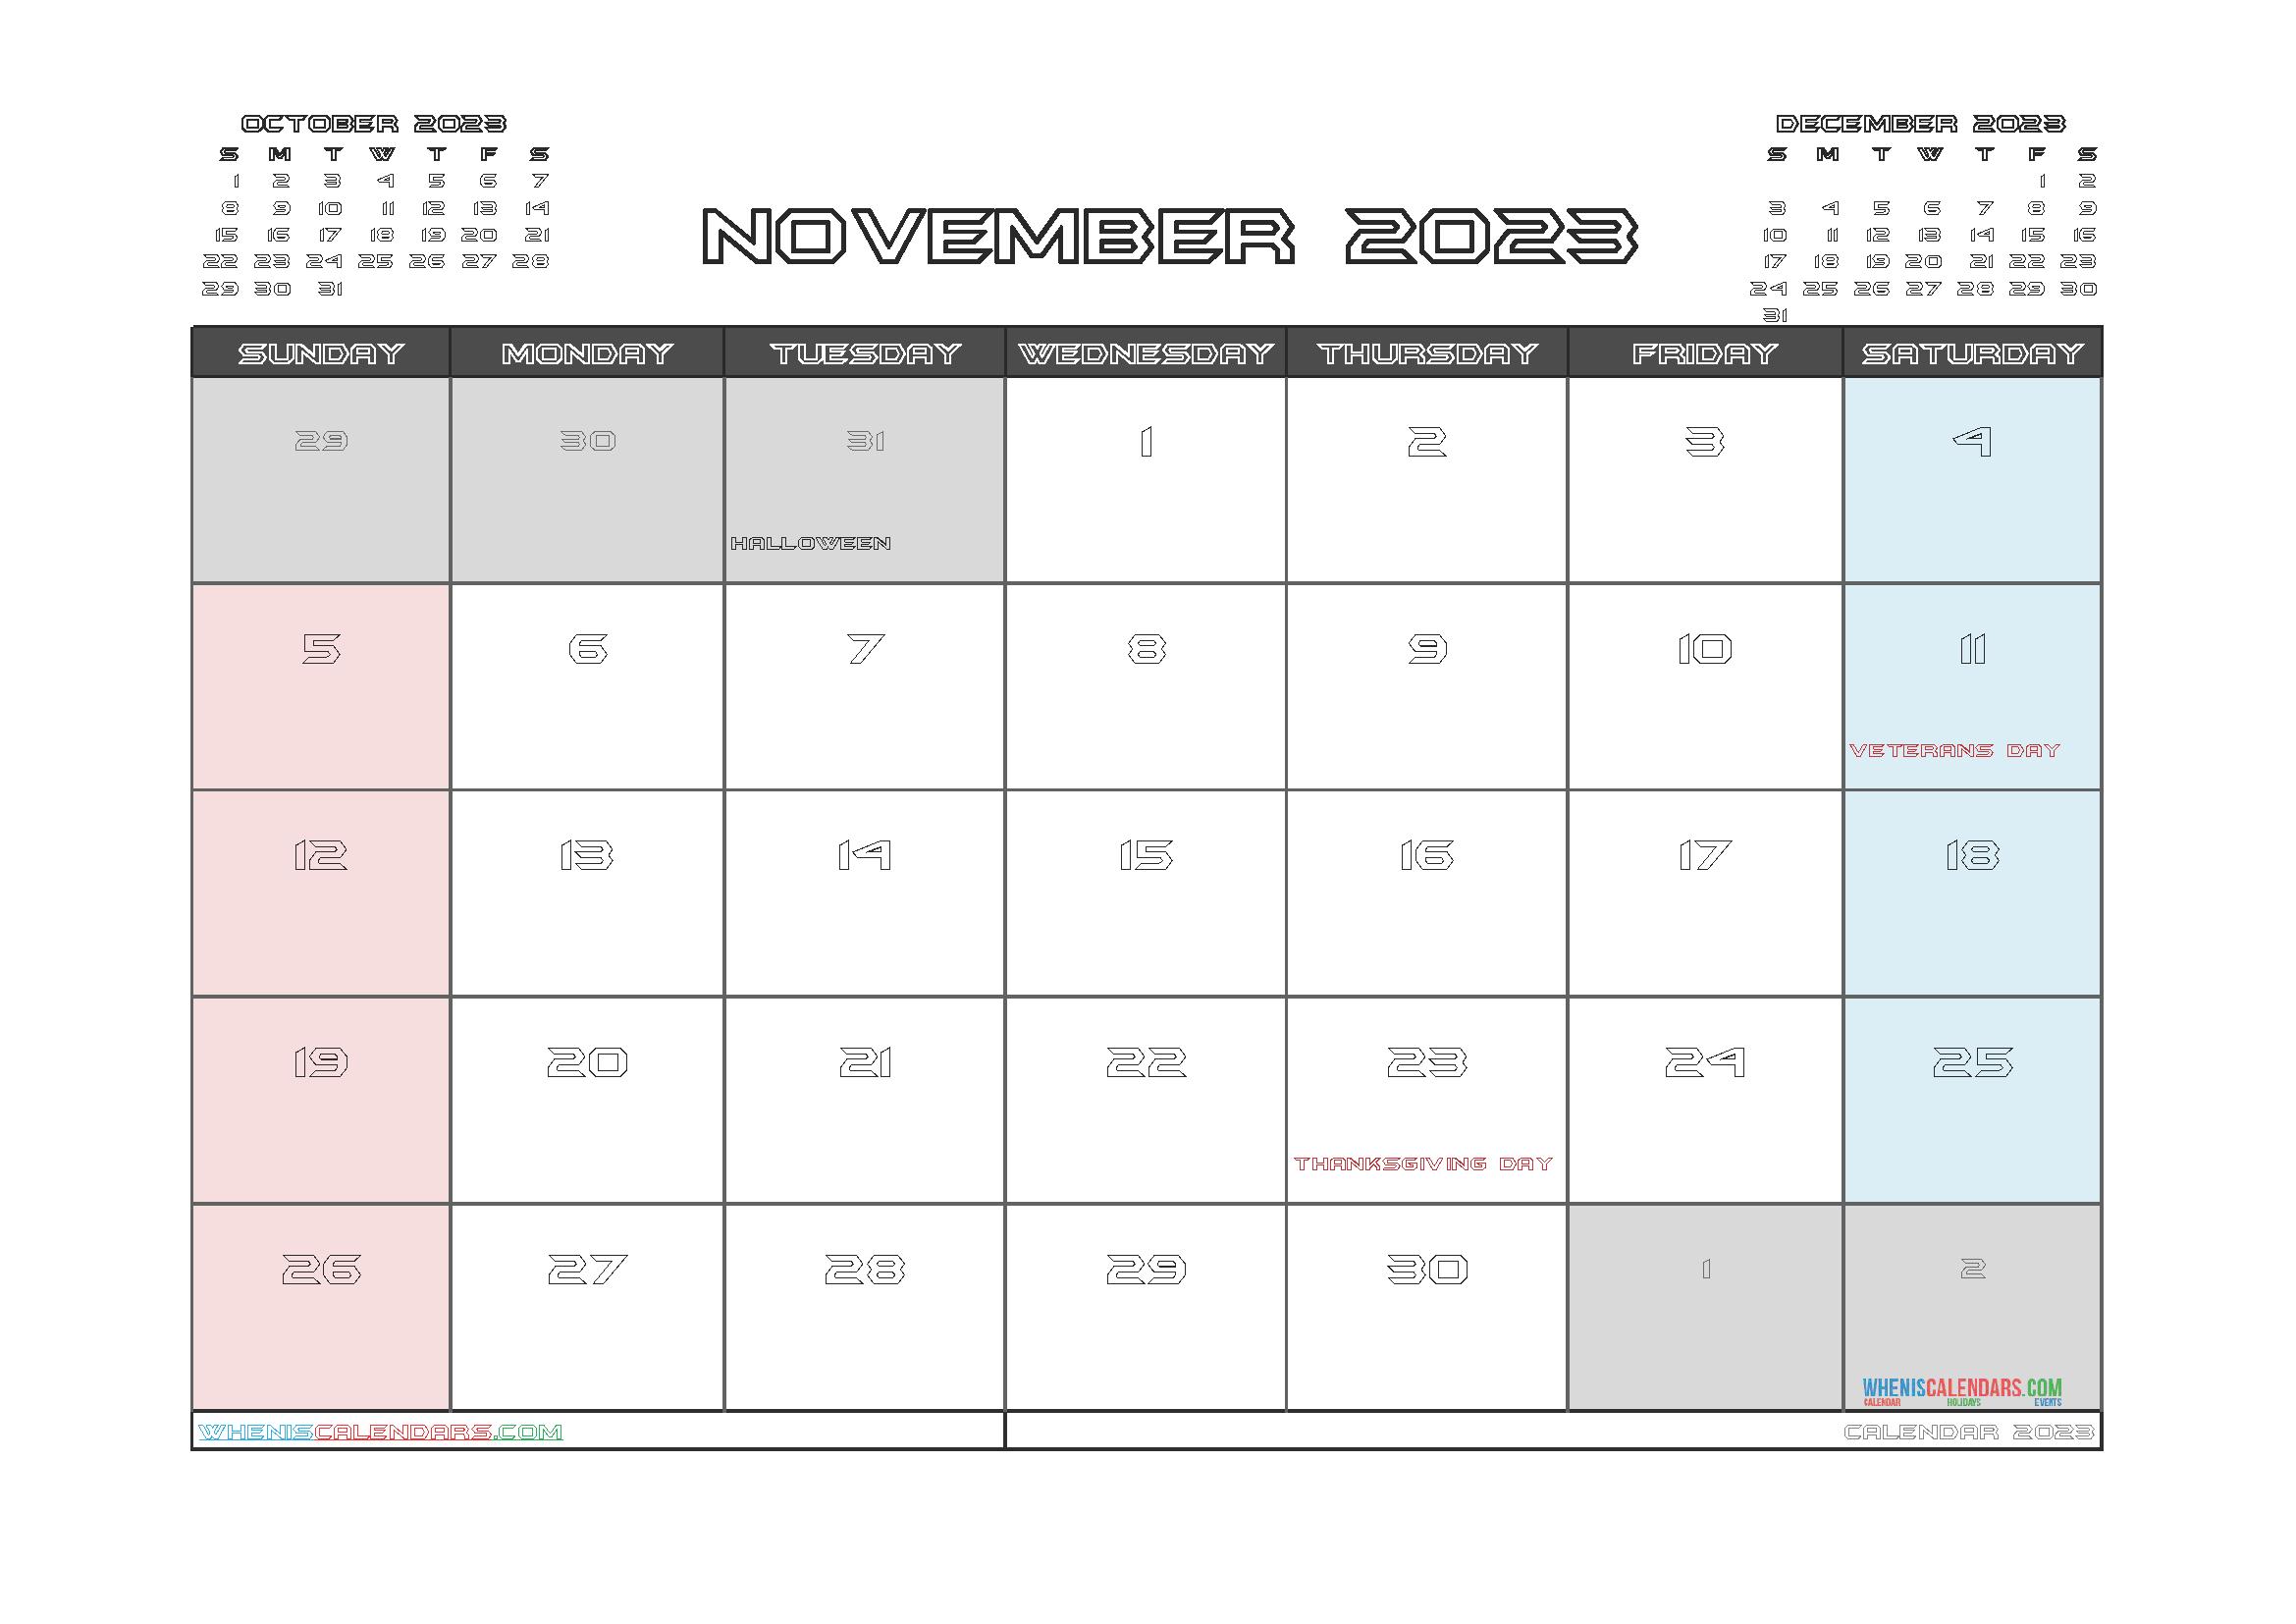 Free November 2023 Printable Calendar